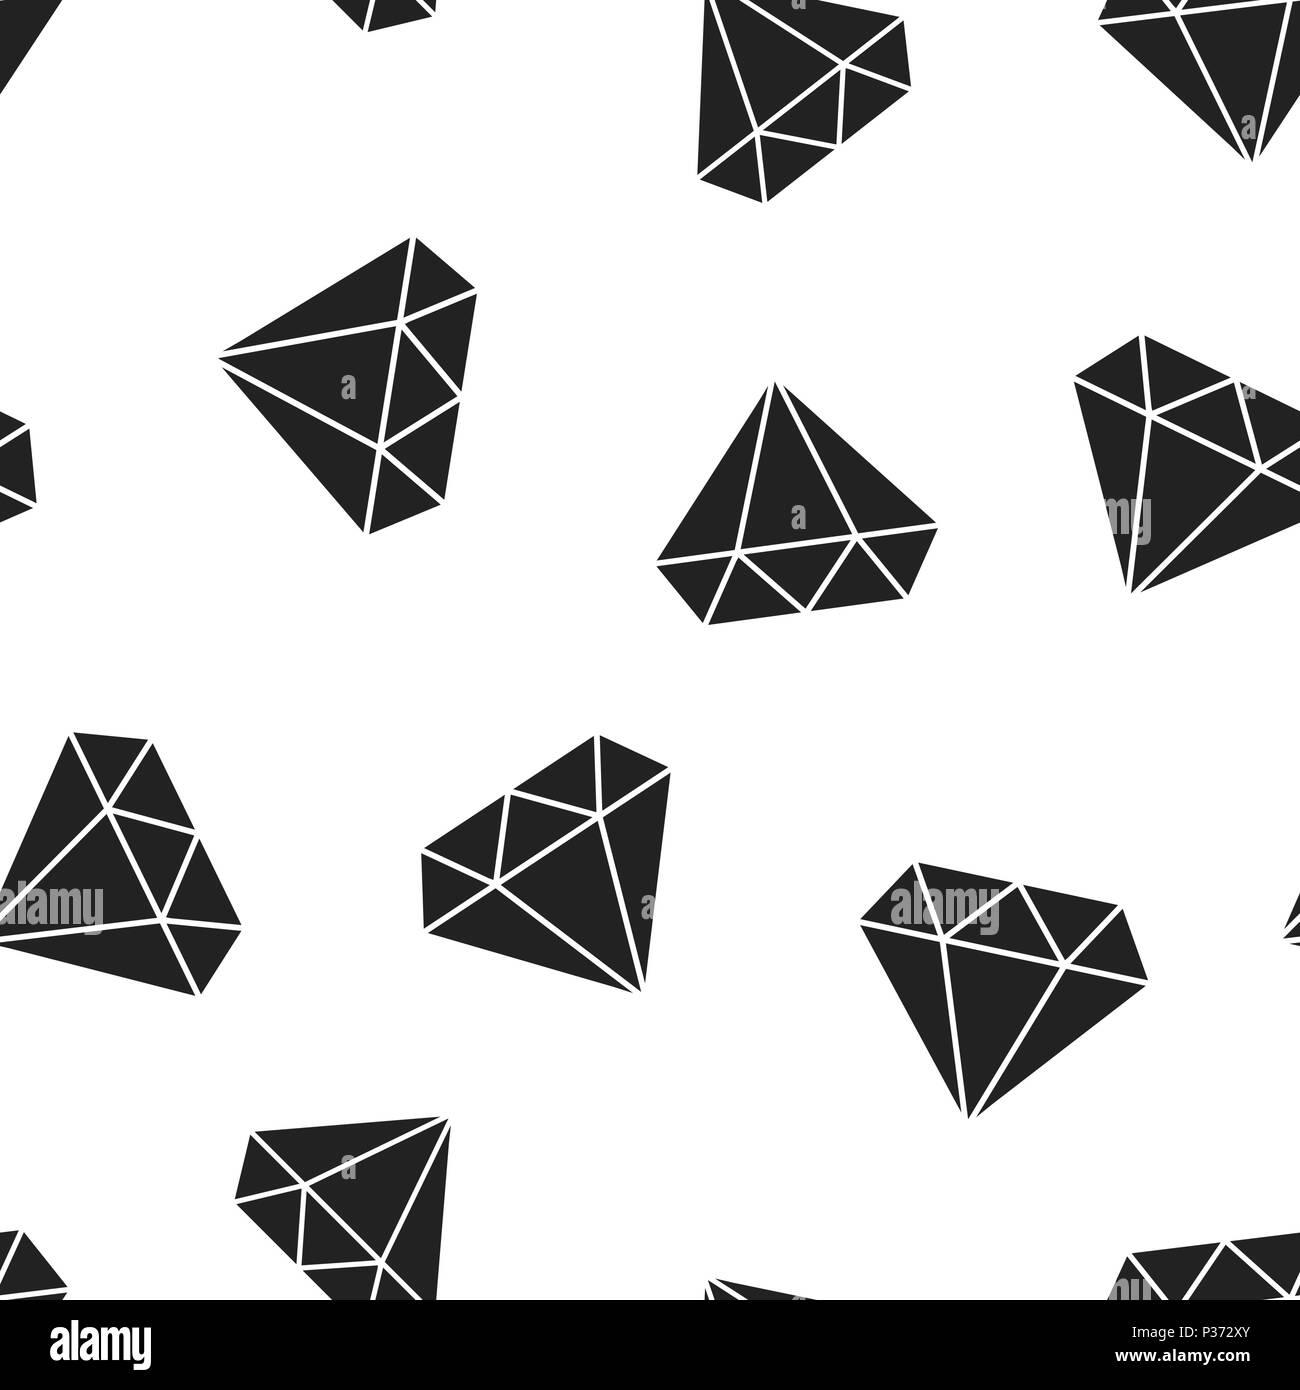 Diamond jewel gem icon seamless pattern background. Business concept vector illustration. Jewelry brilliant gemstone symbol pattern. - Stock Image